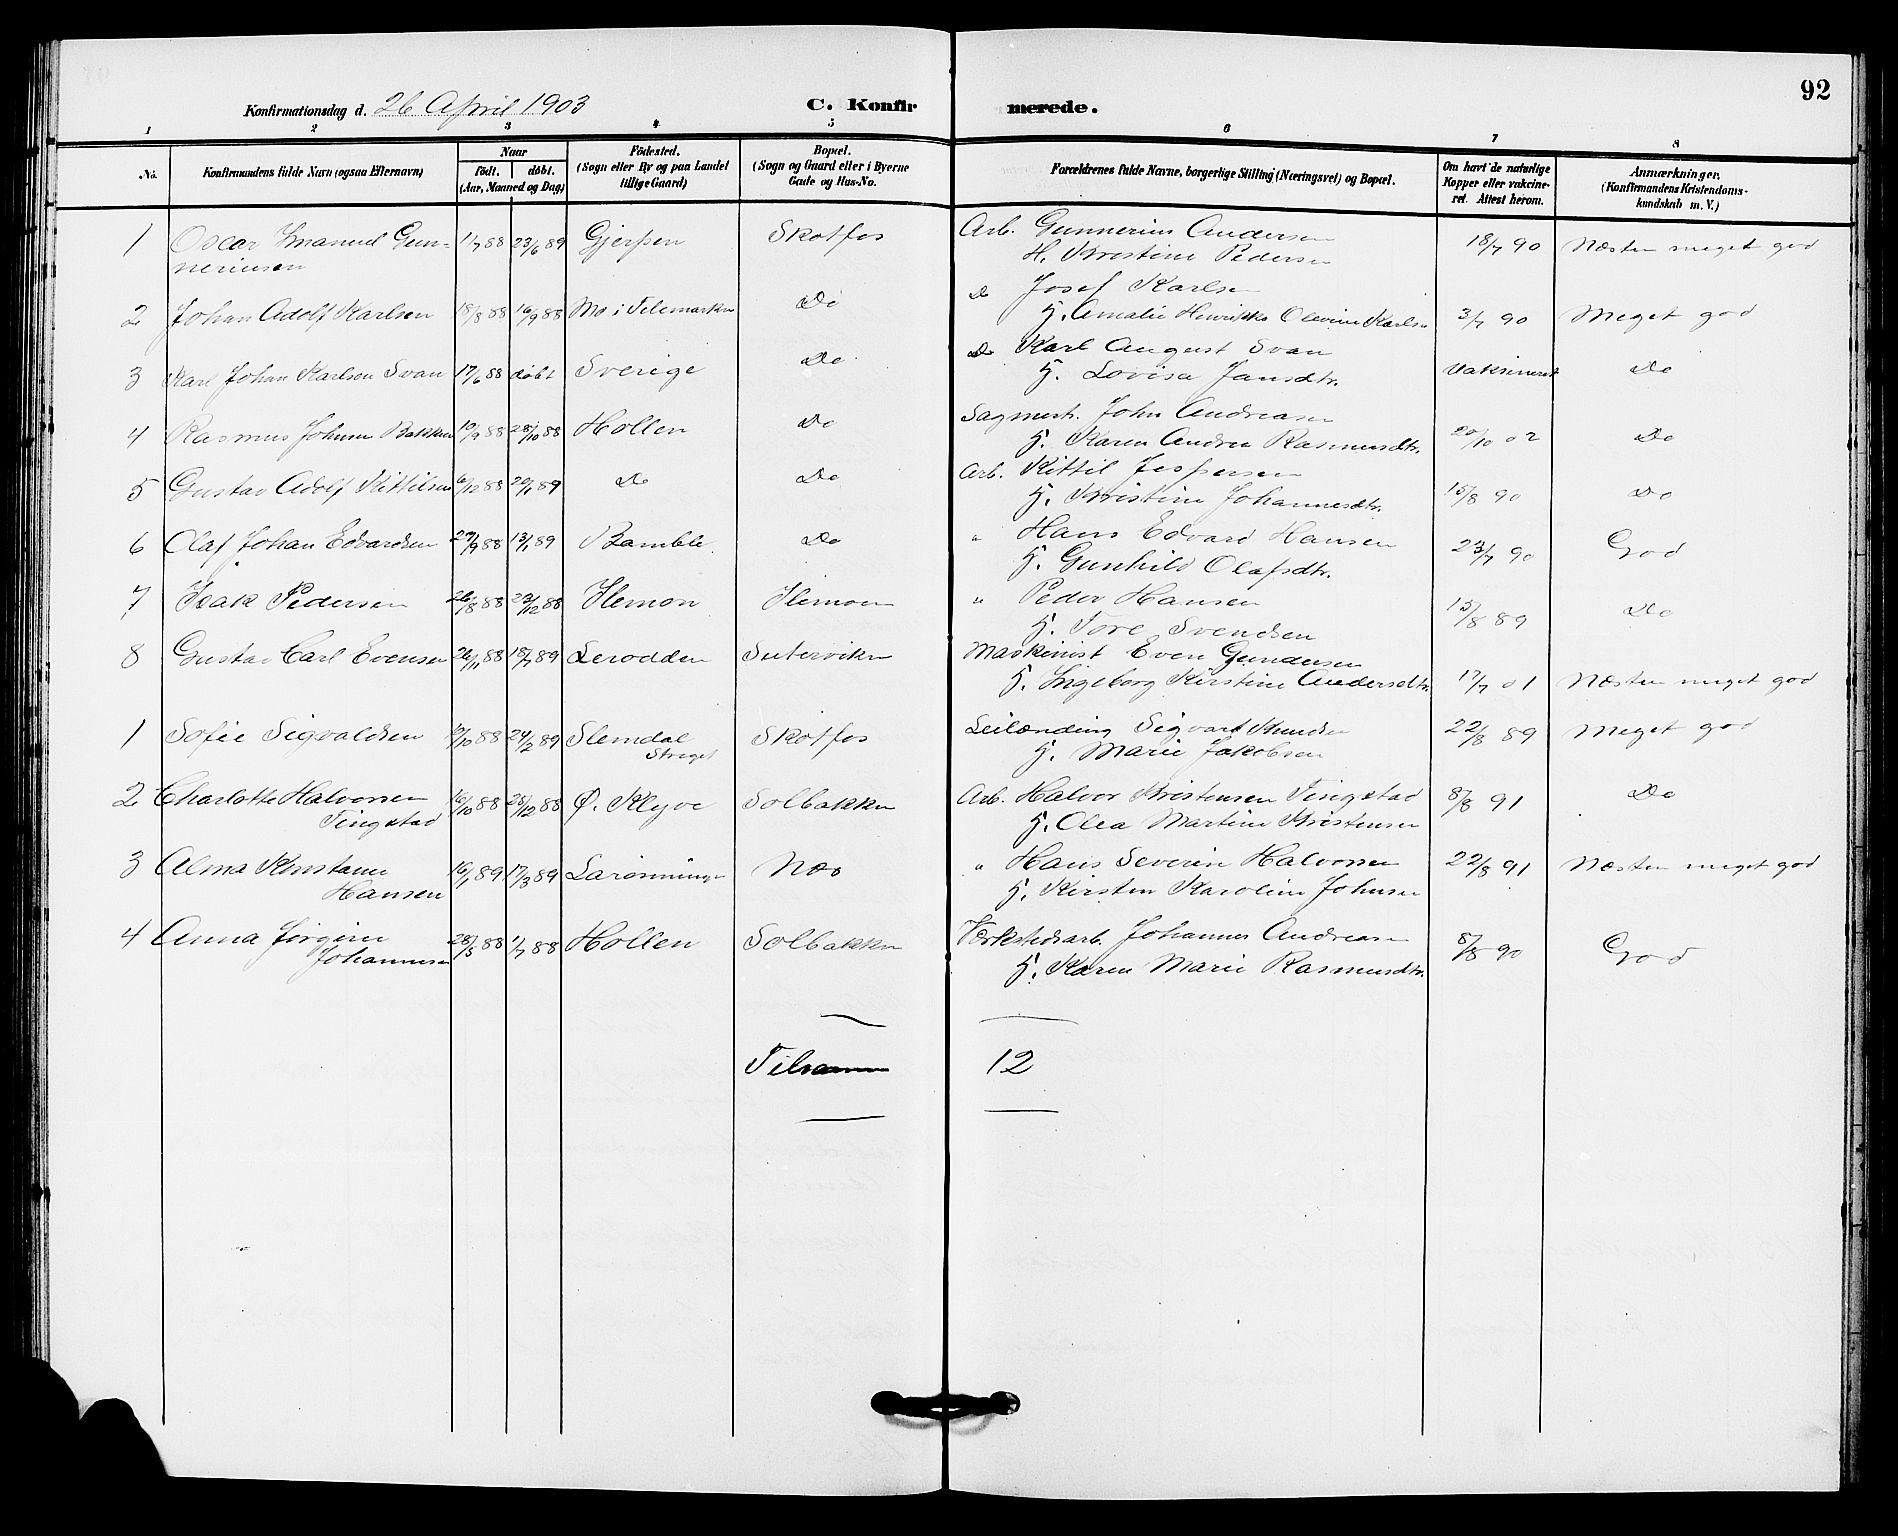 SAKO, Solum kirkebøker, G/Gb/L0004: Klokkerbok nr. II 4, 1898-1905, s. 92